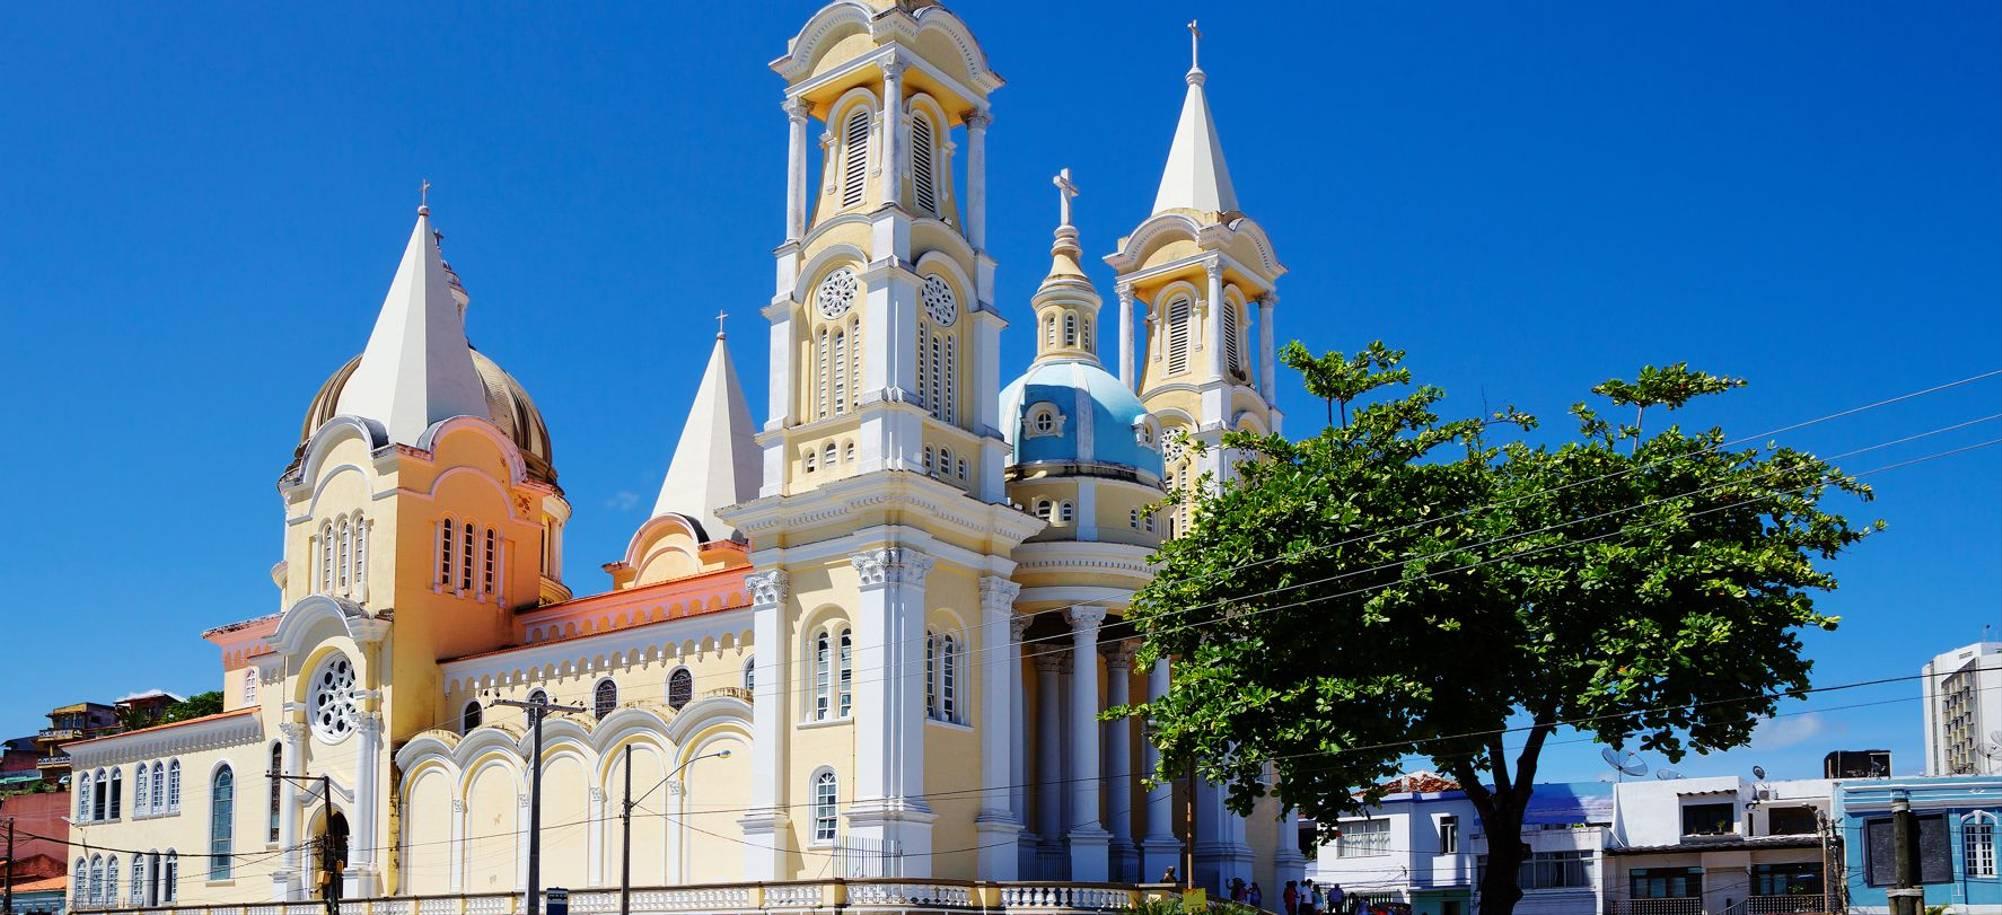 Ilheus - San Sebastian Cathedral - Itinerary Desktop .jpg